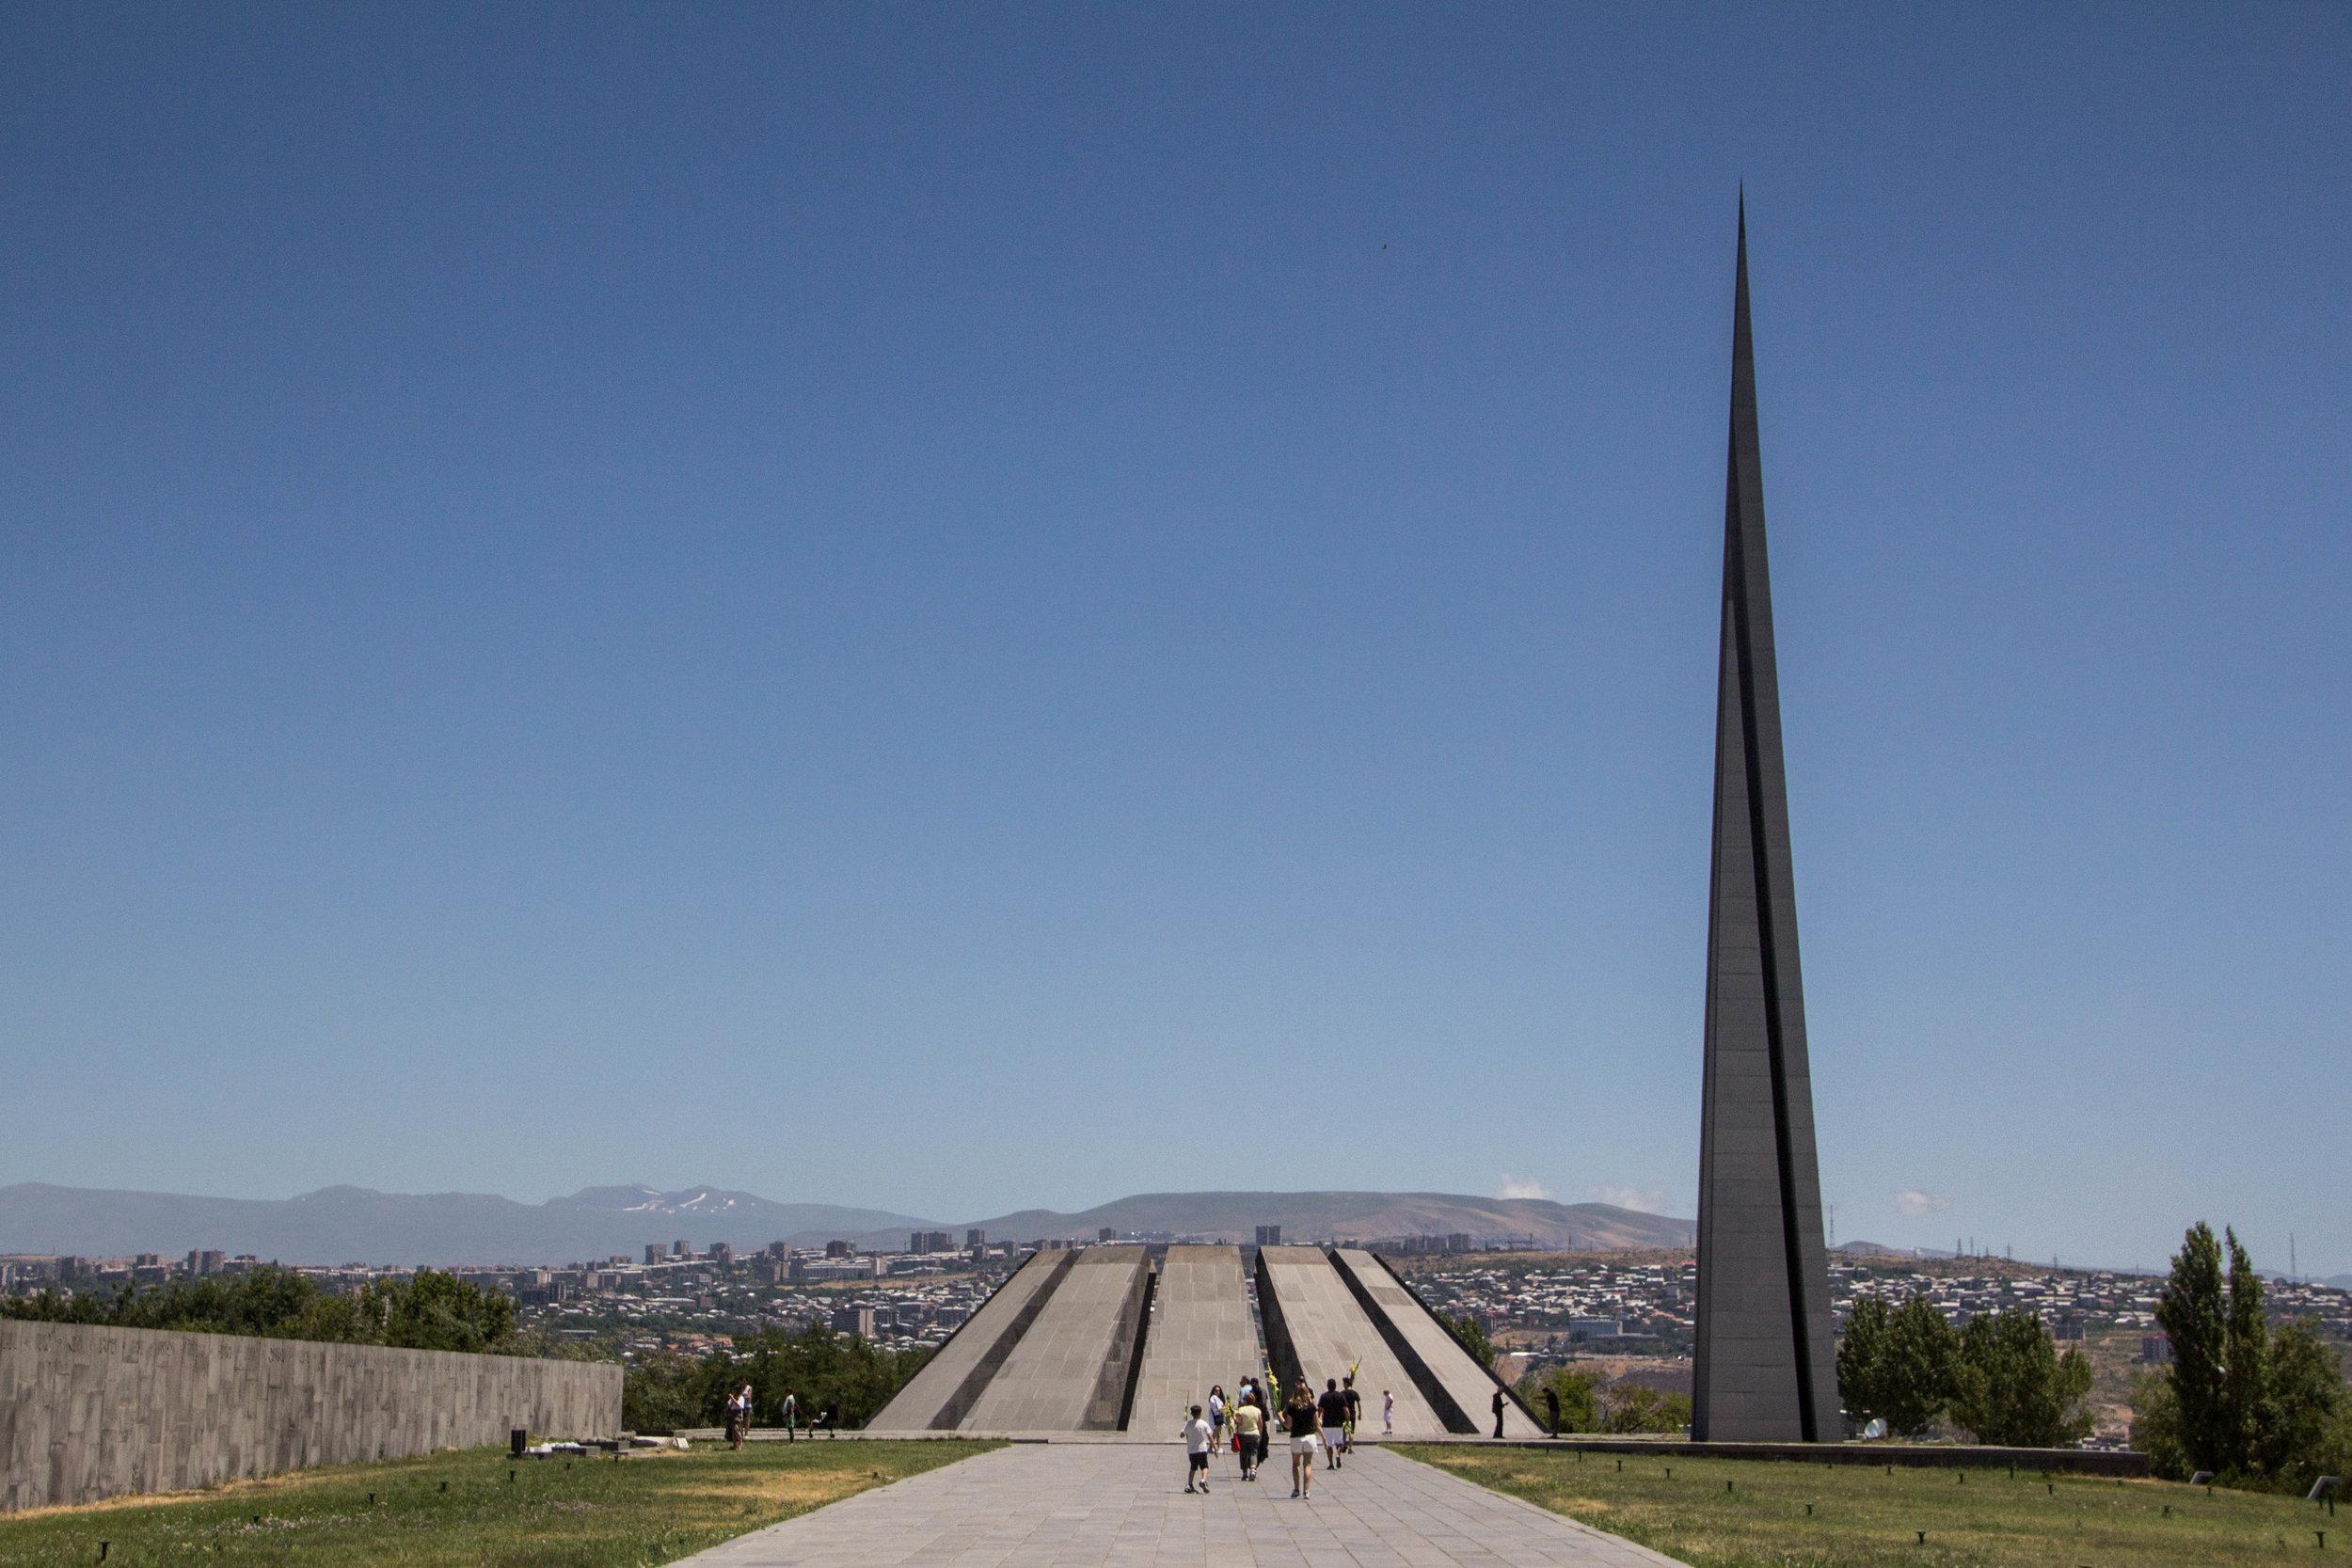 tsitsernakaberd-armenian-genocide-memorial-21.jpg